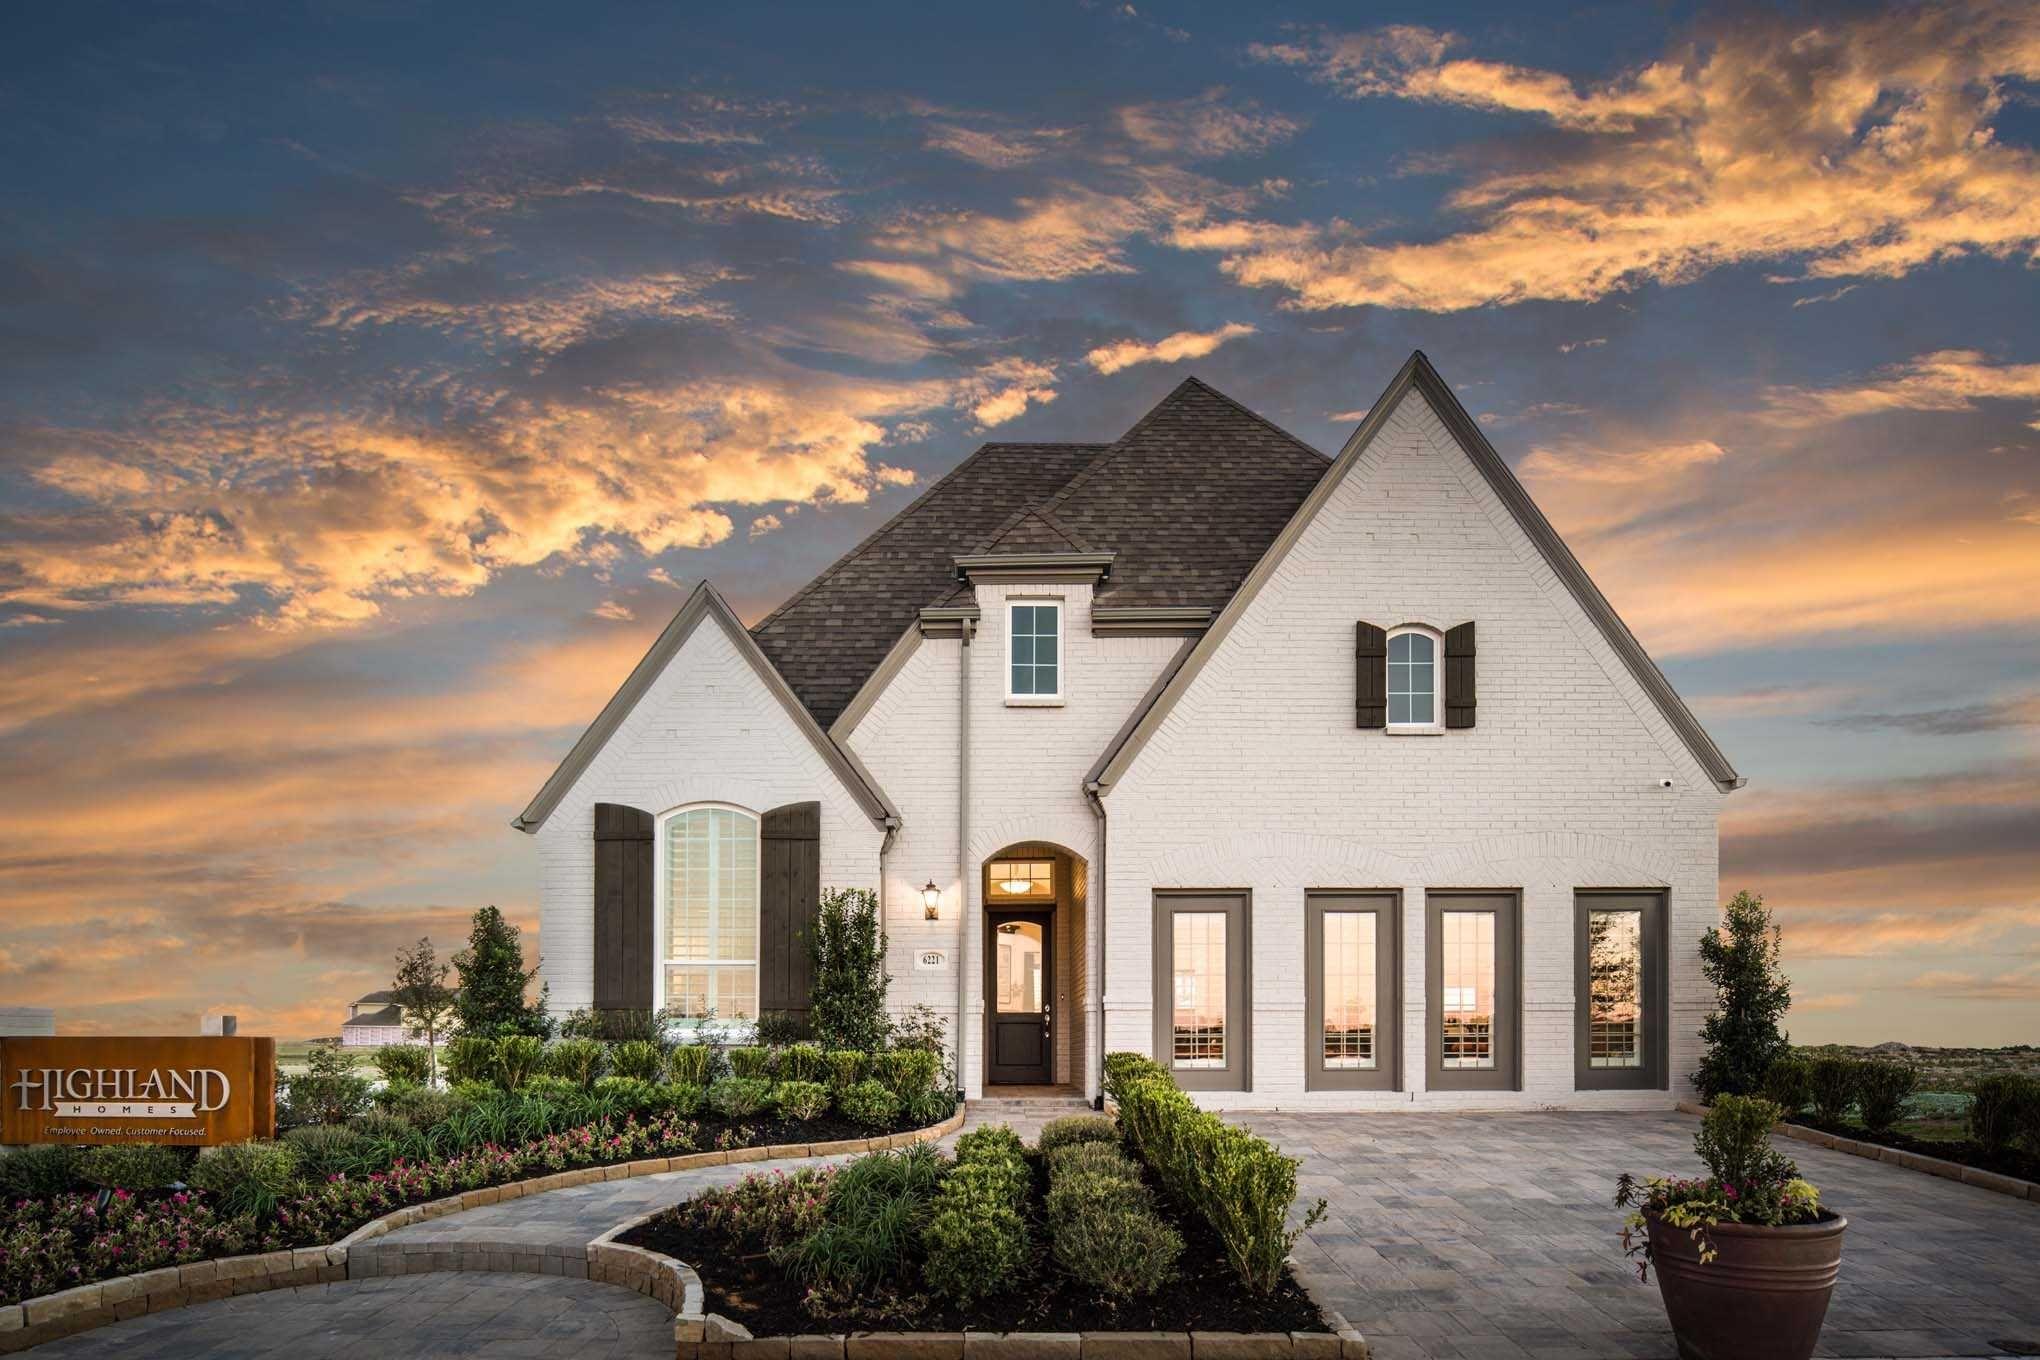 Highland Homes Trinity Falls 50s Dfw Plan 553 Highland Homes New Homes Home Builders